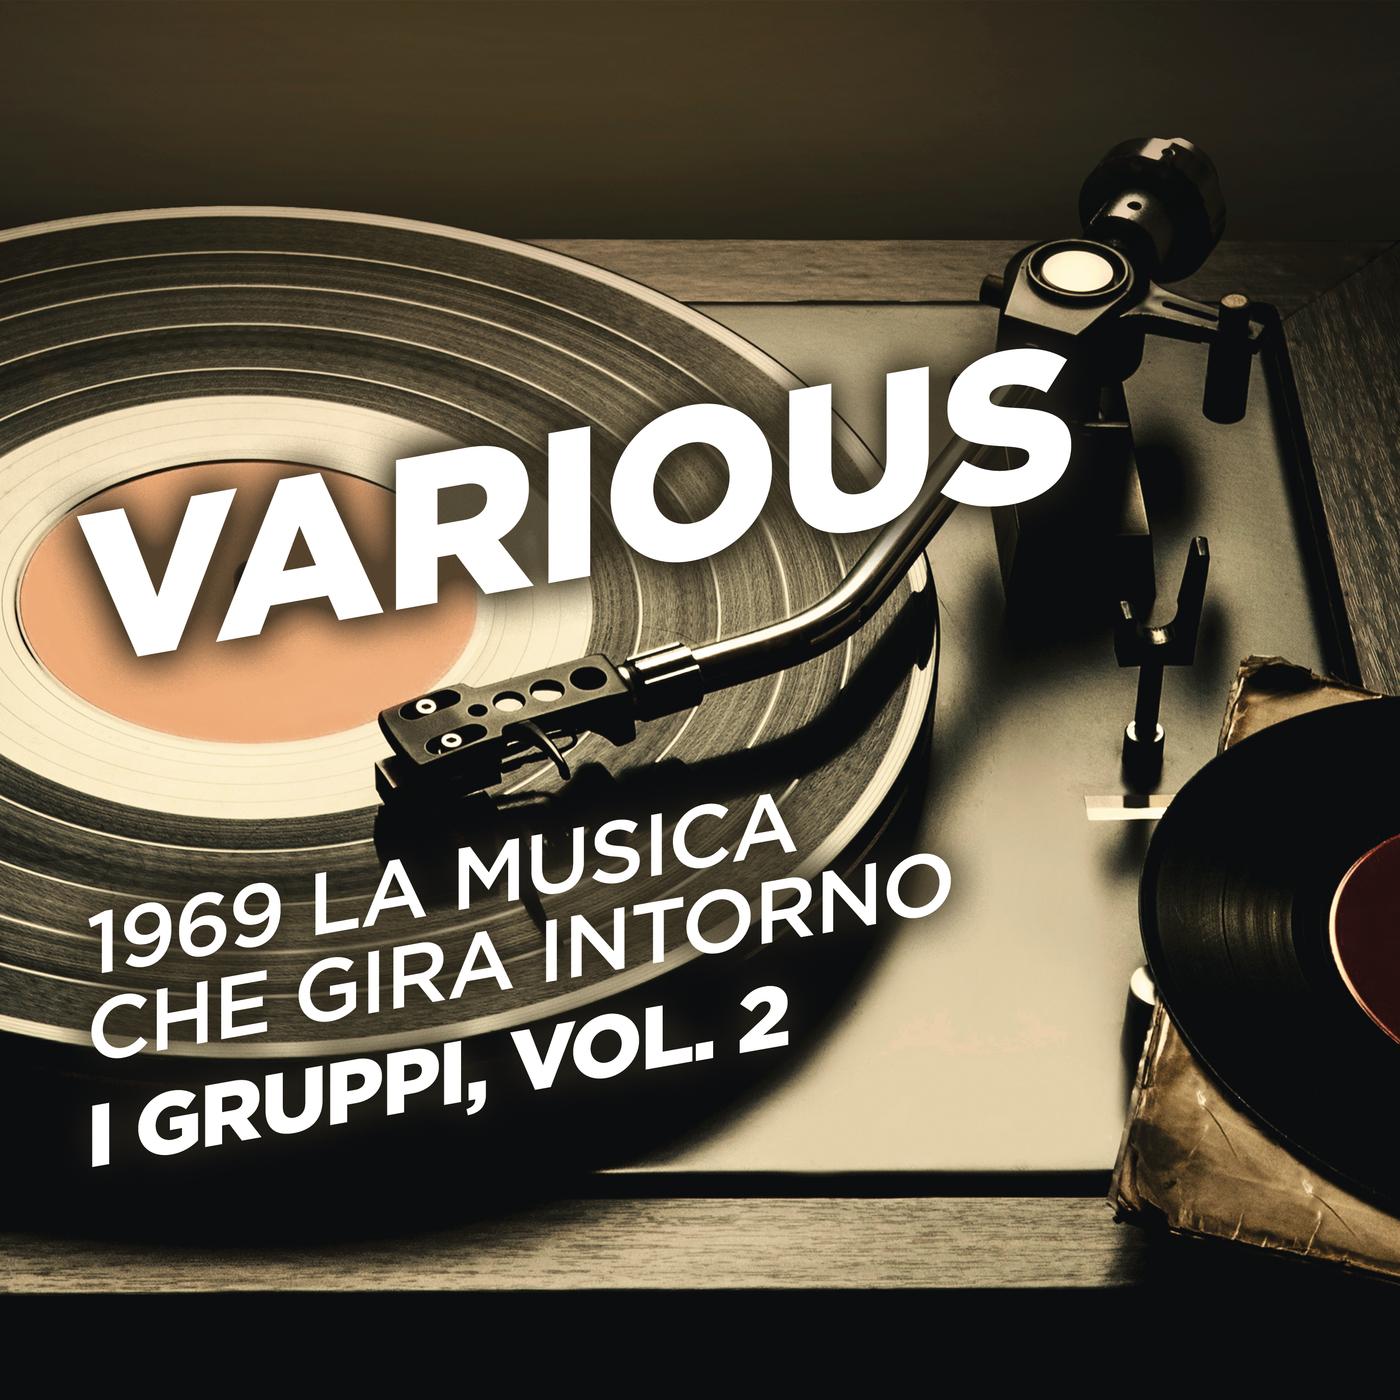 1969 La musica che gira intorno - I gruppi, Vol. 2 - Various Artists